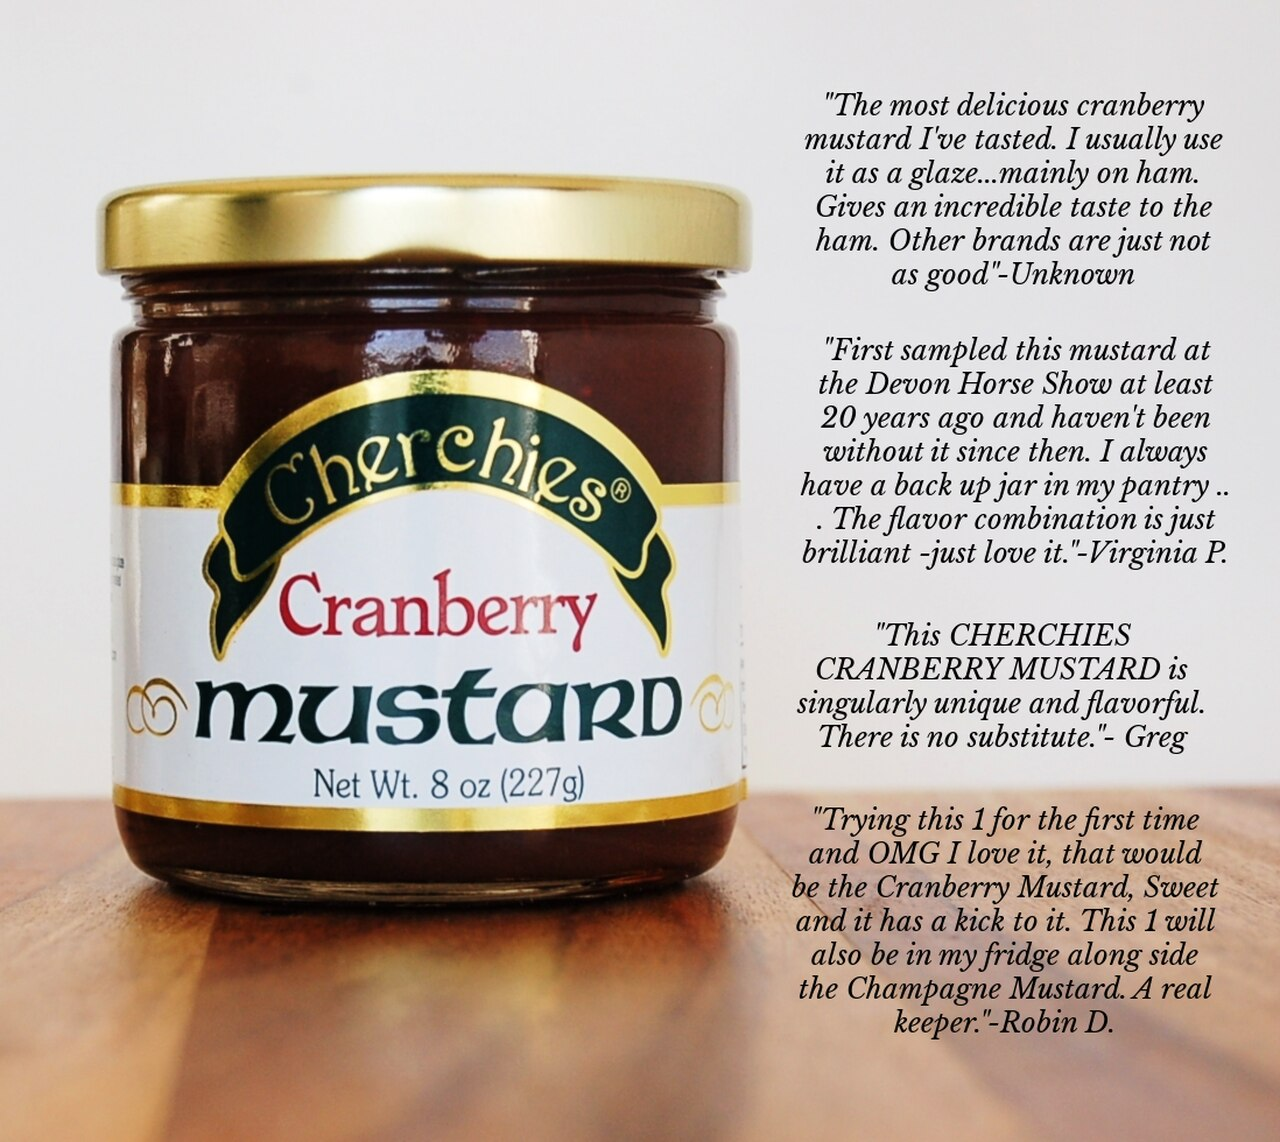 Cherchies Cranberry Mustard